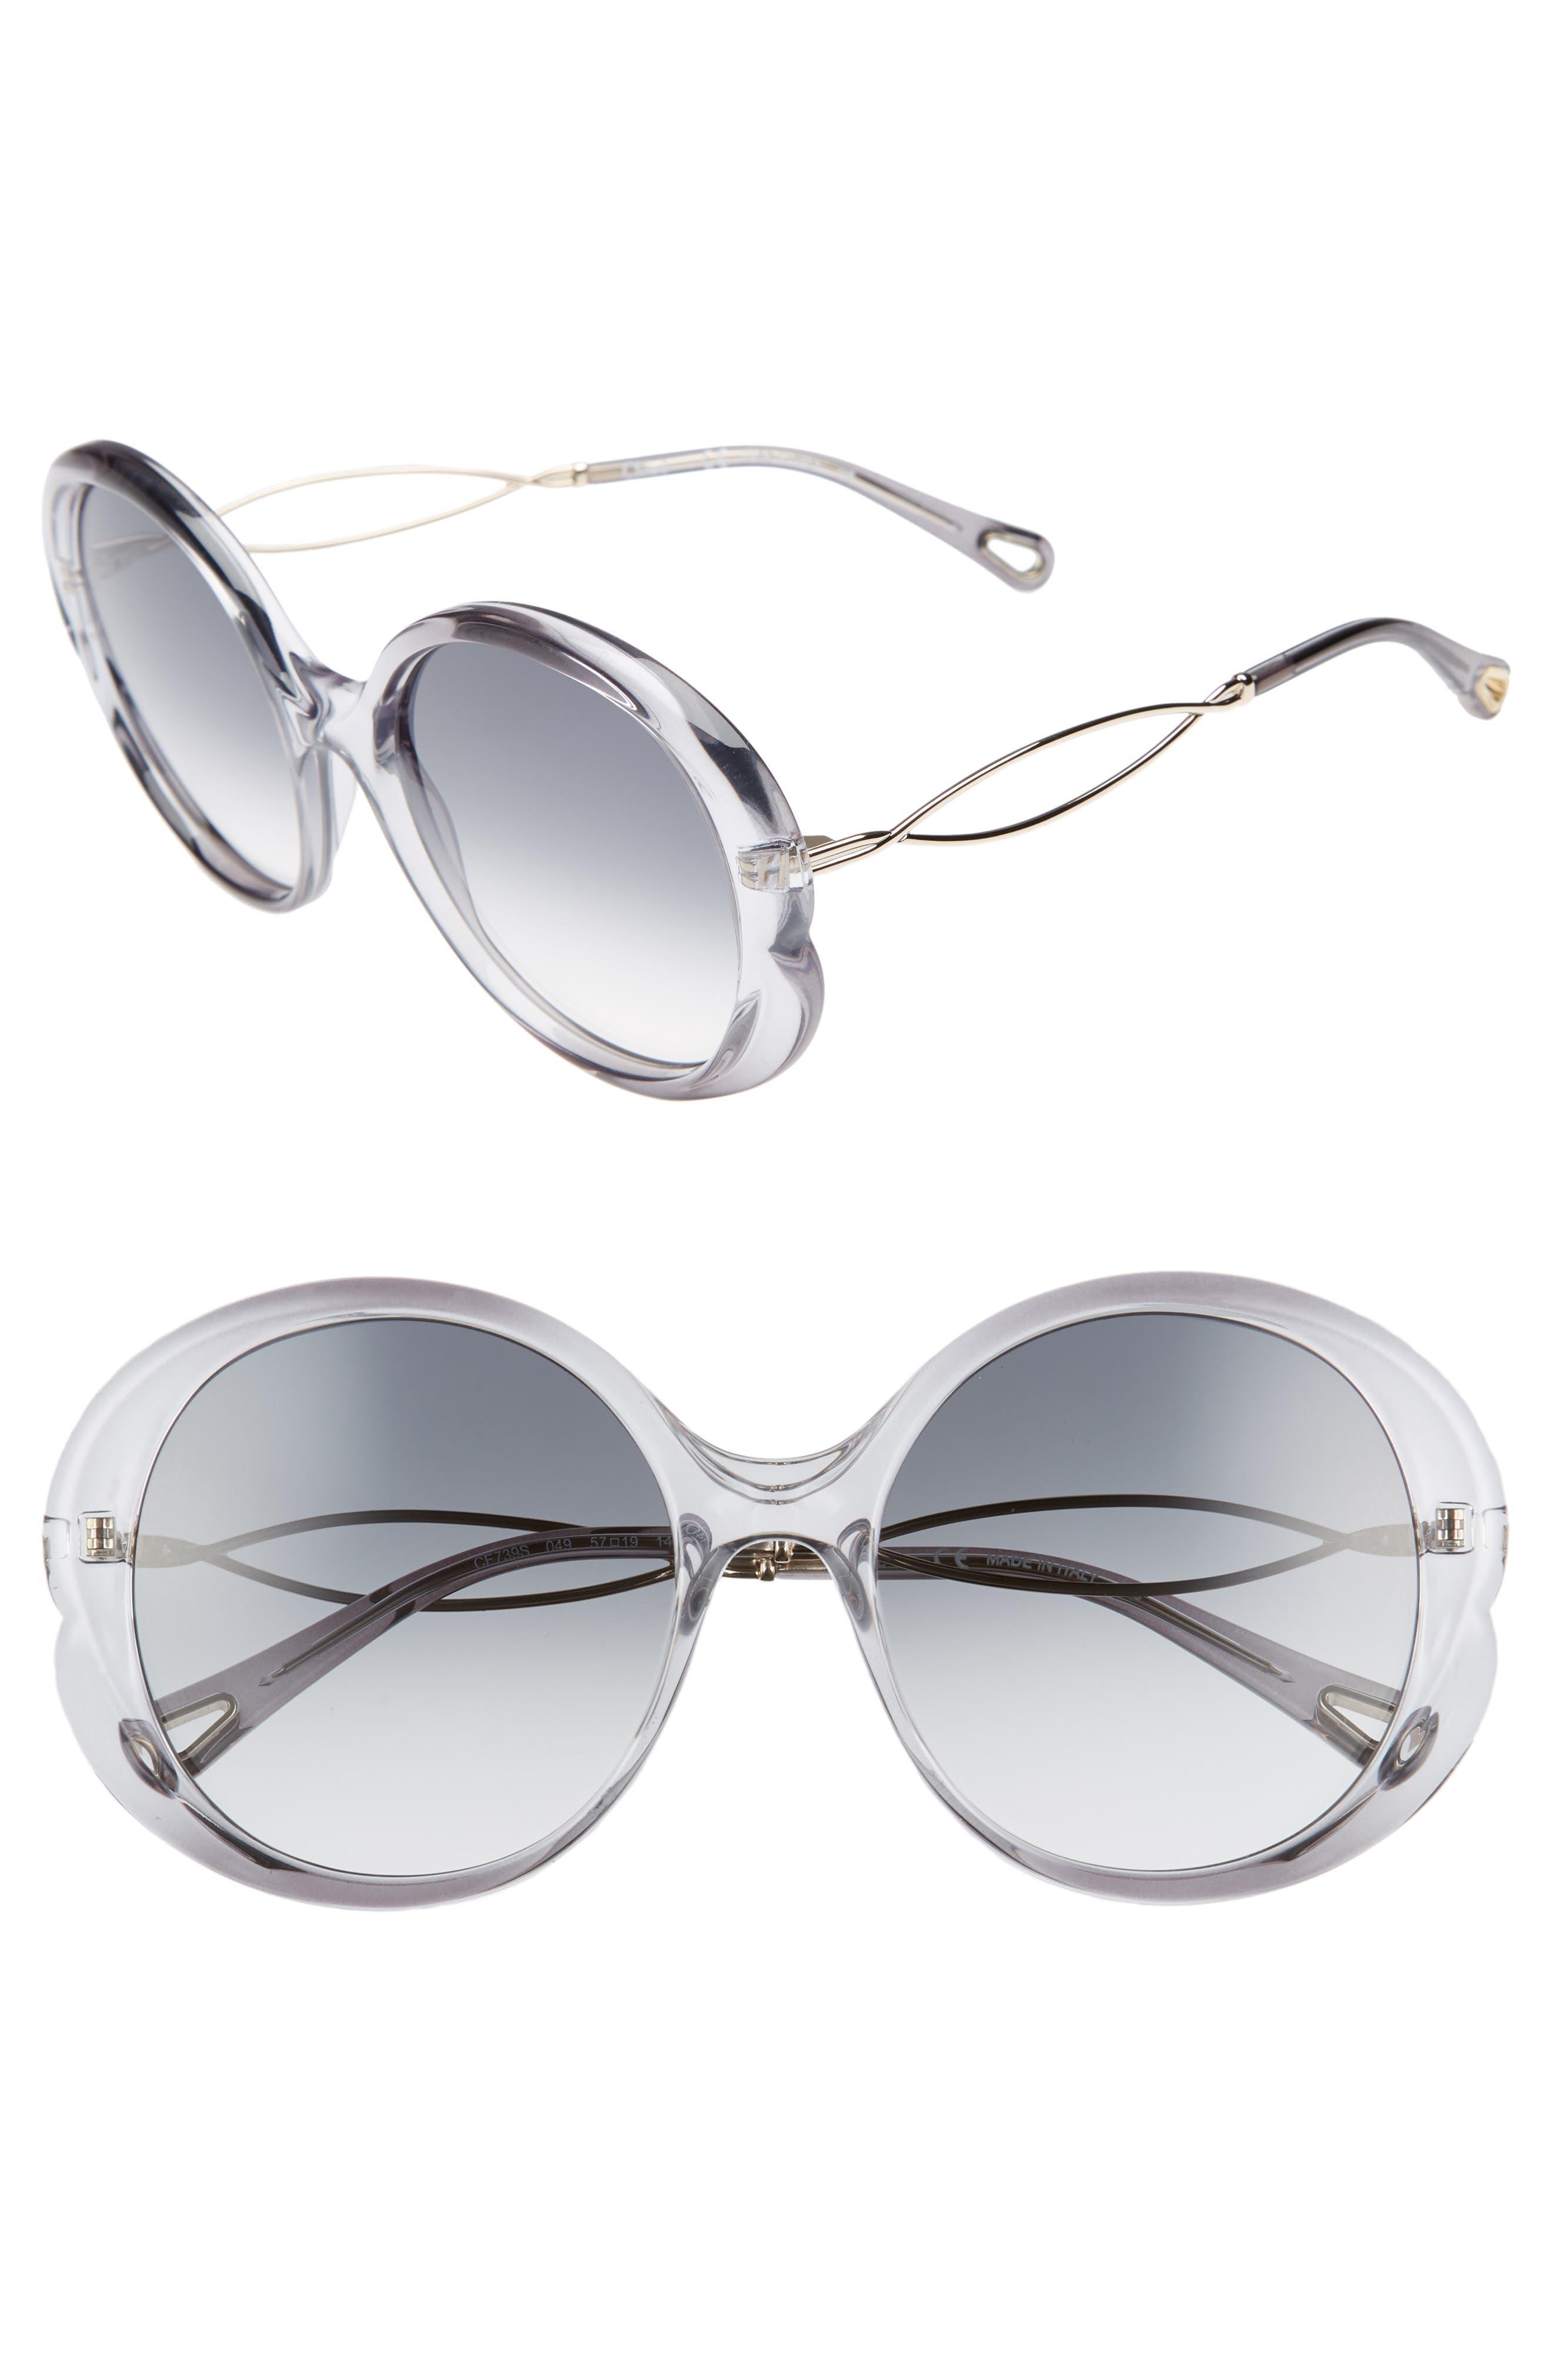 CHLOÉ Petal 57mm Gradient Round Sunglasses, Main, color, GREY/ LIGHT GREY